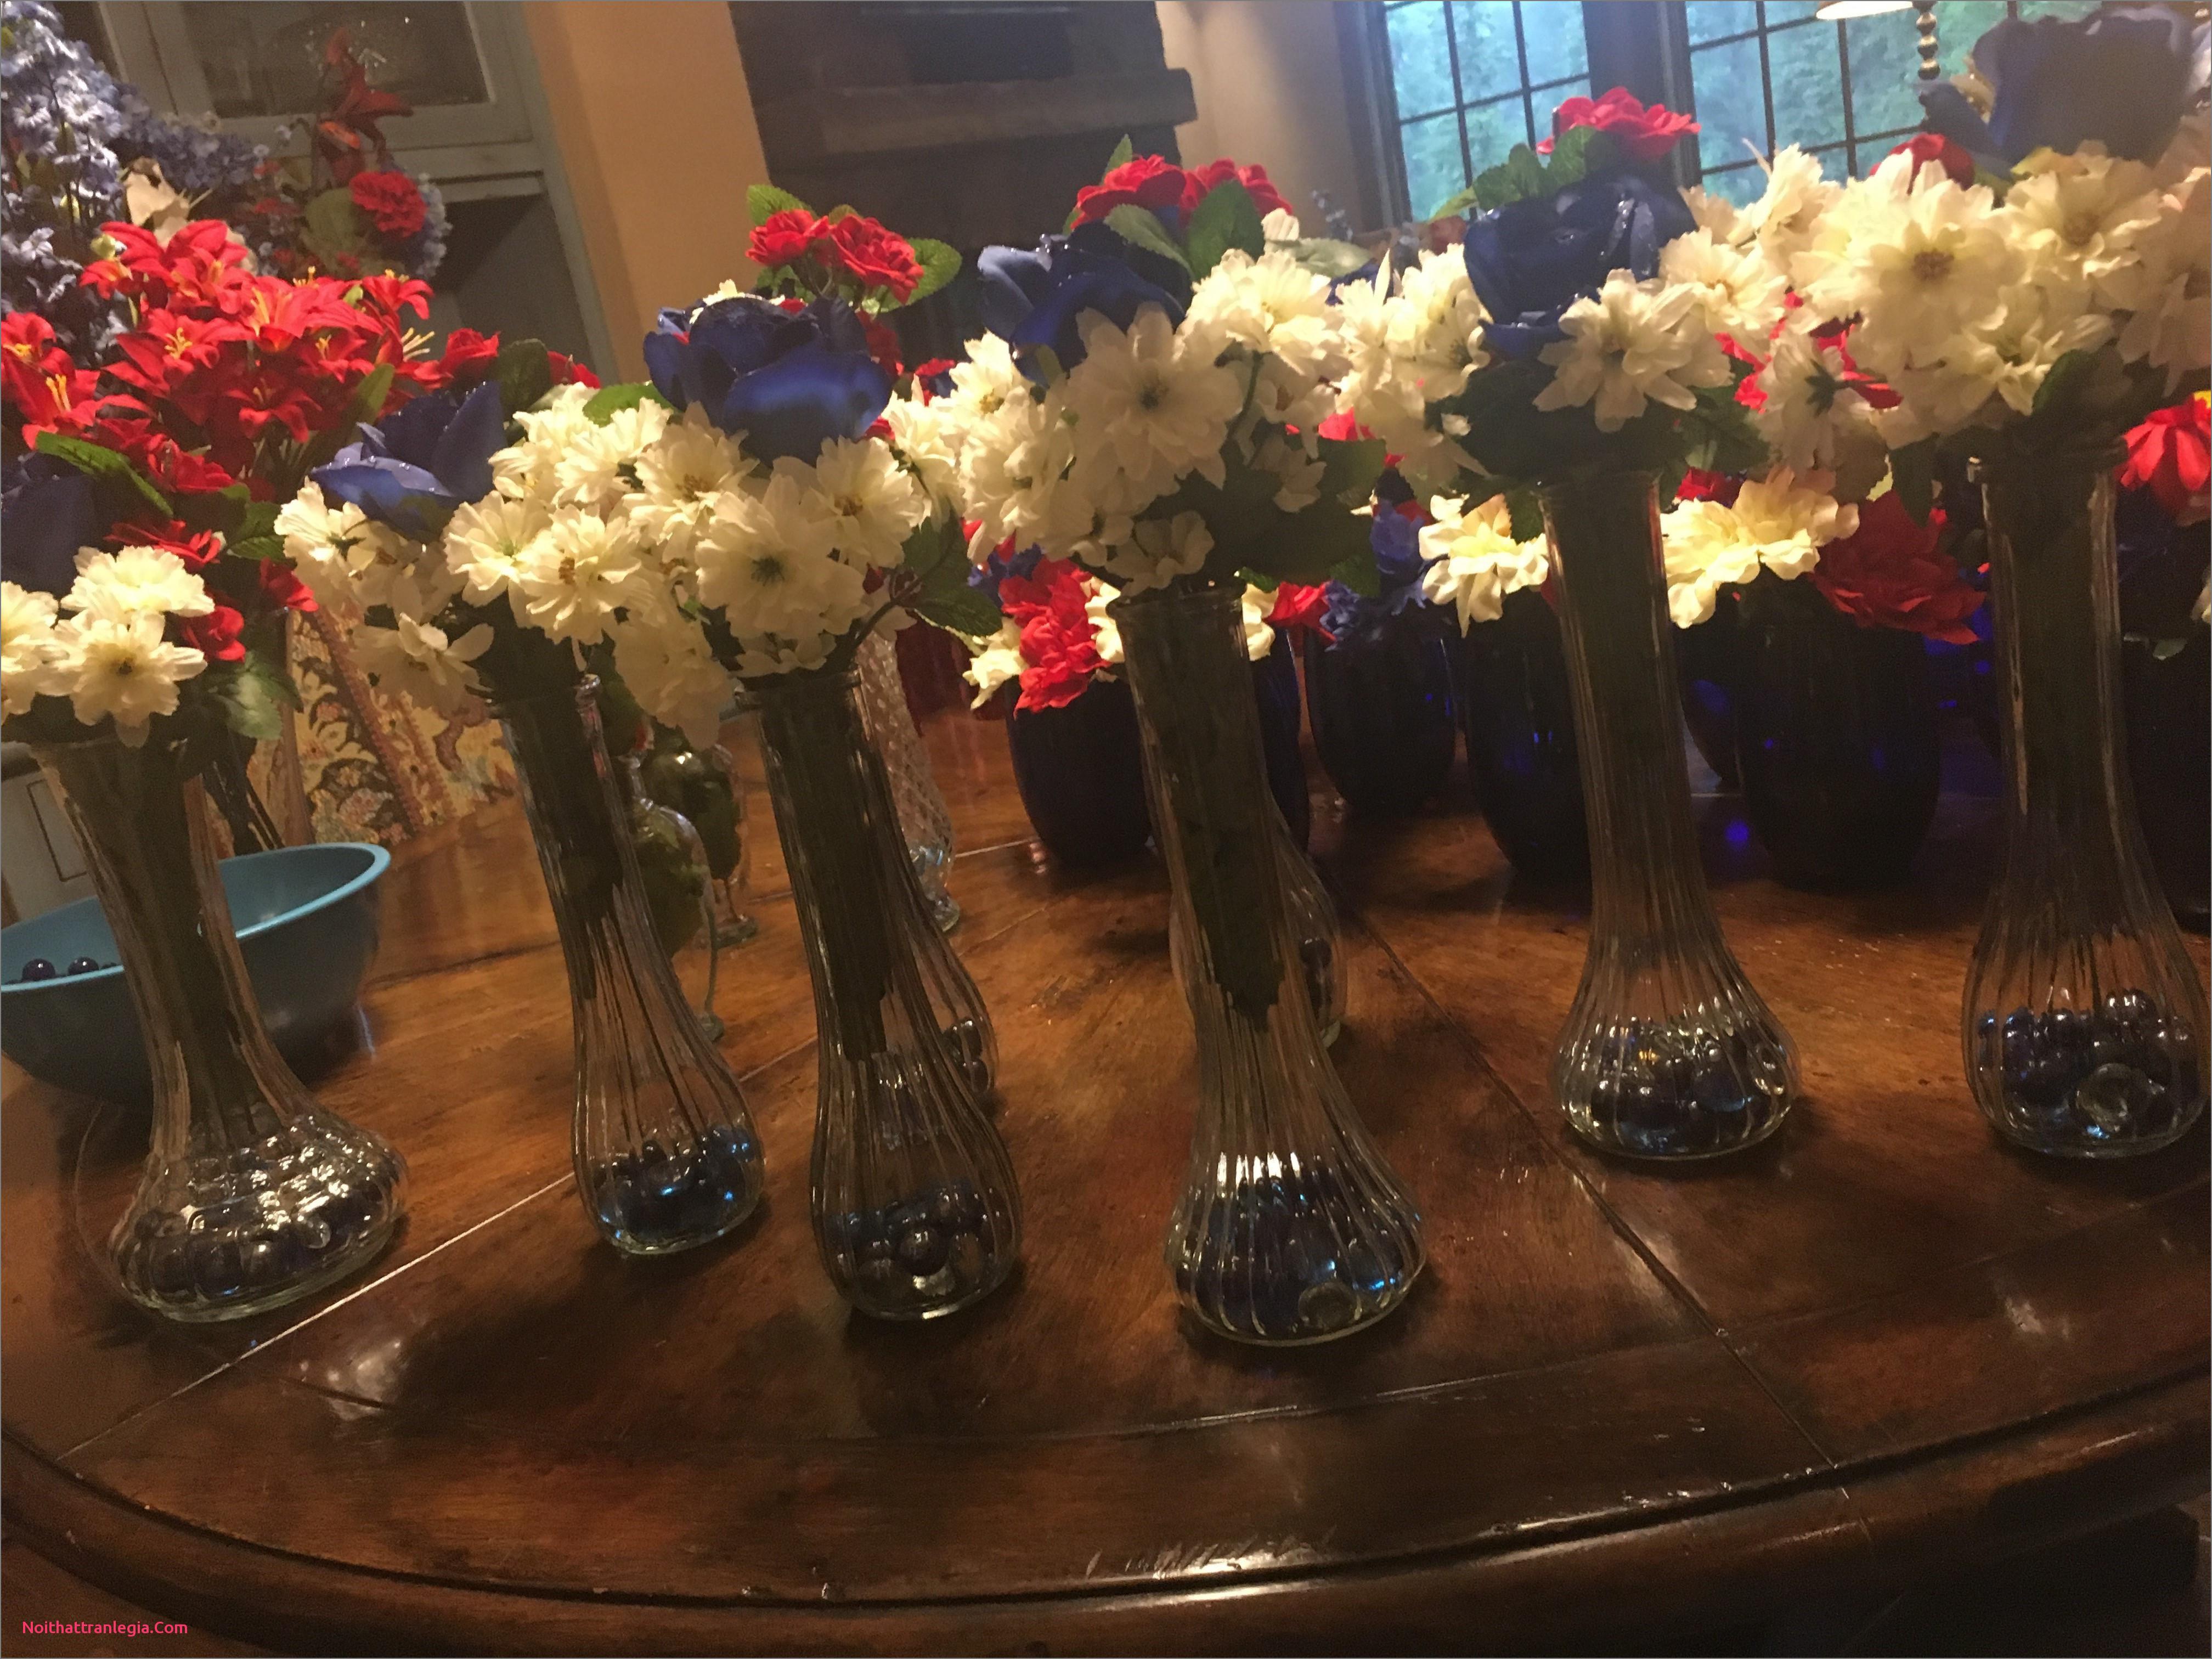 red and white glass vase of 20 wedding vases noithattranlegia vases design intended for decoration line luxury dollar tree wedding decorations awesome h vases dollar vase i 0d